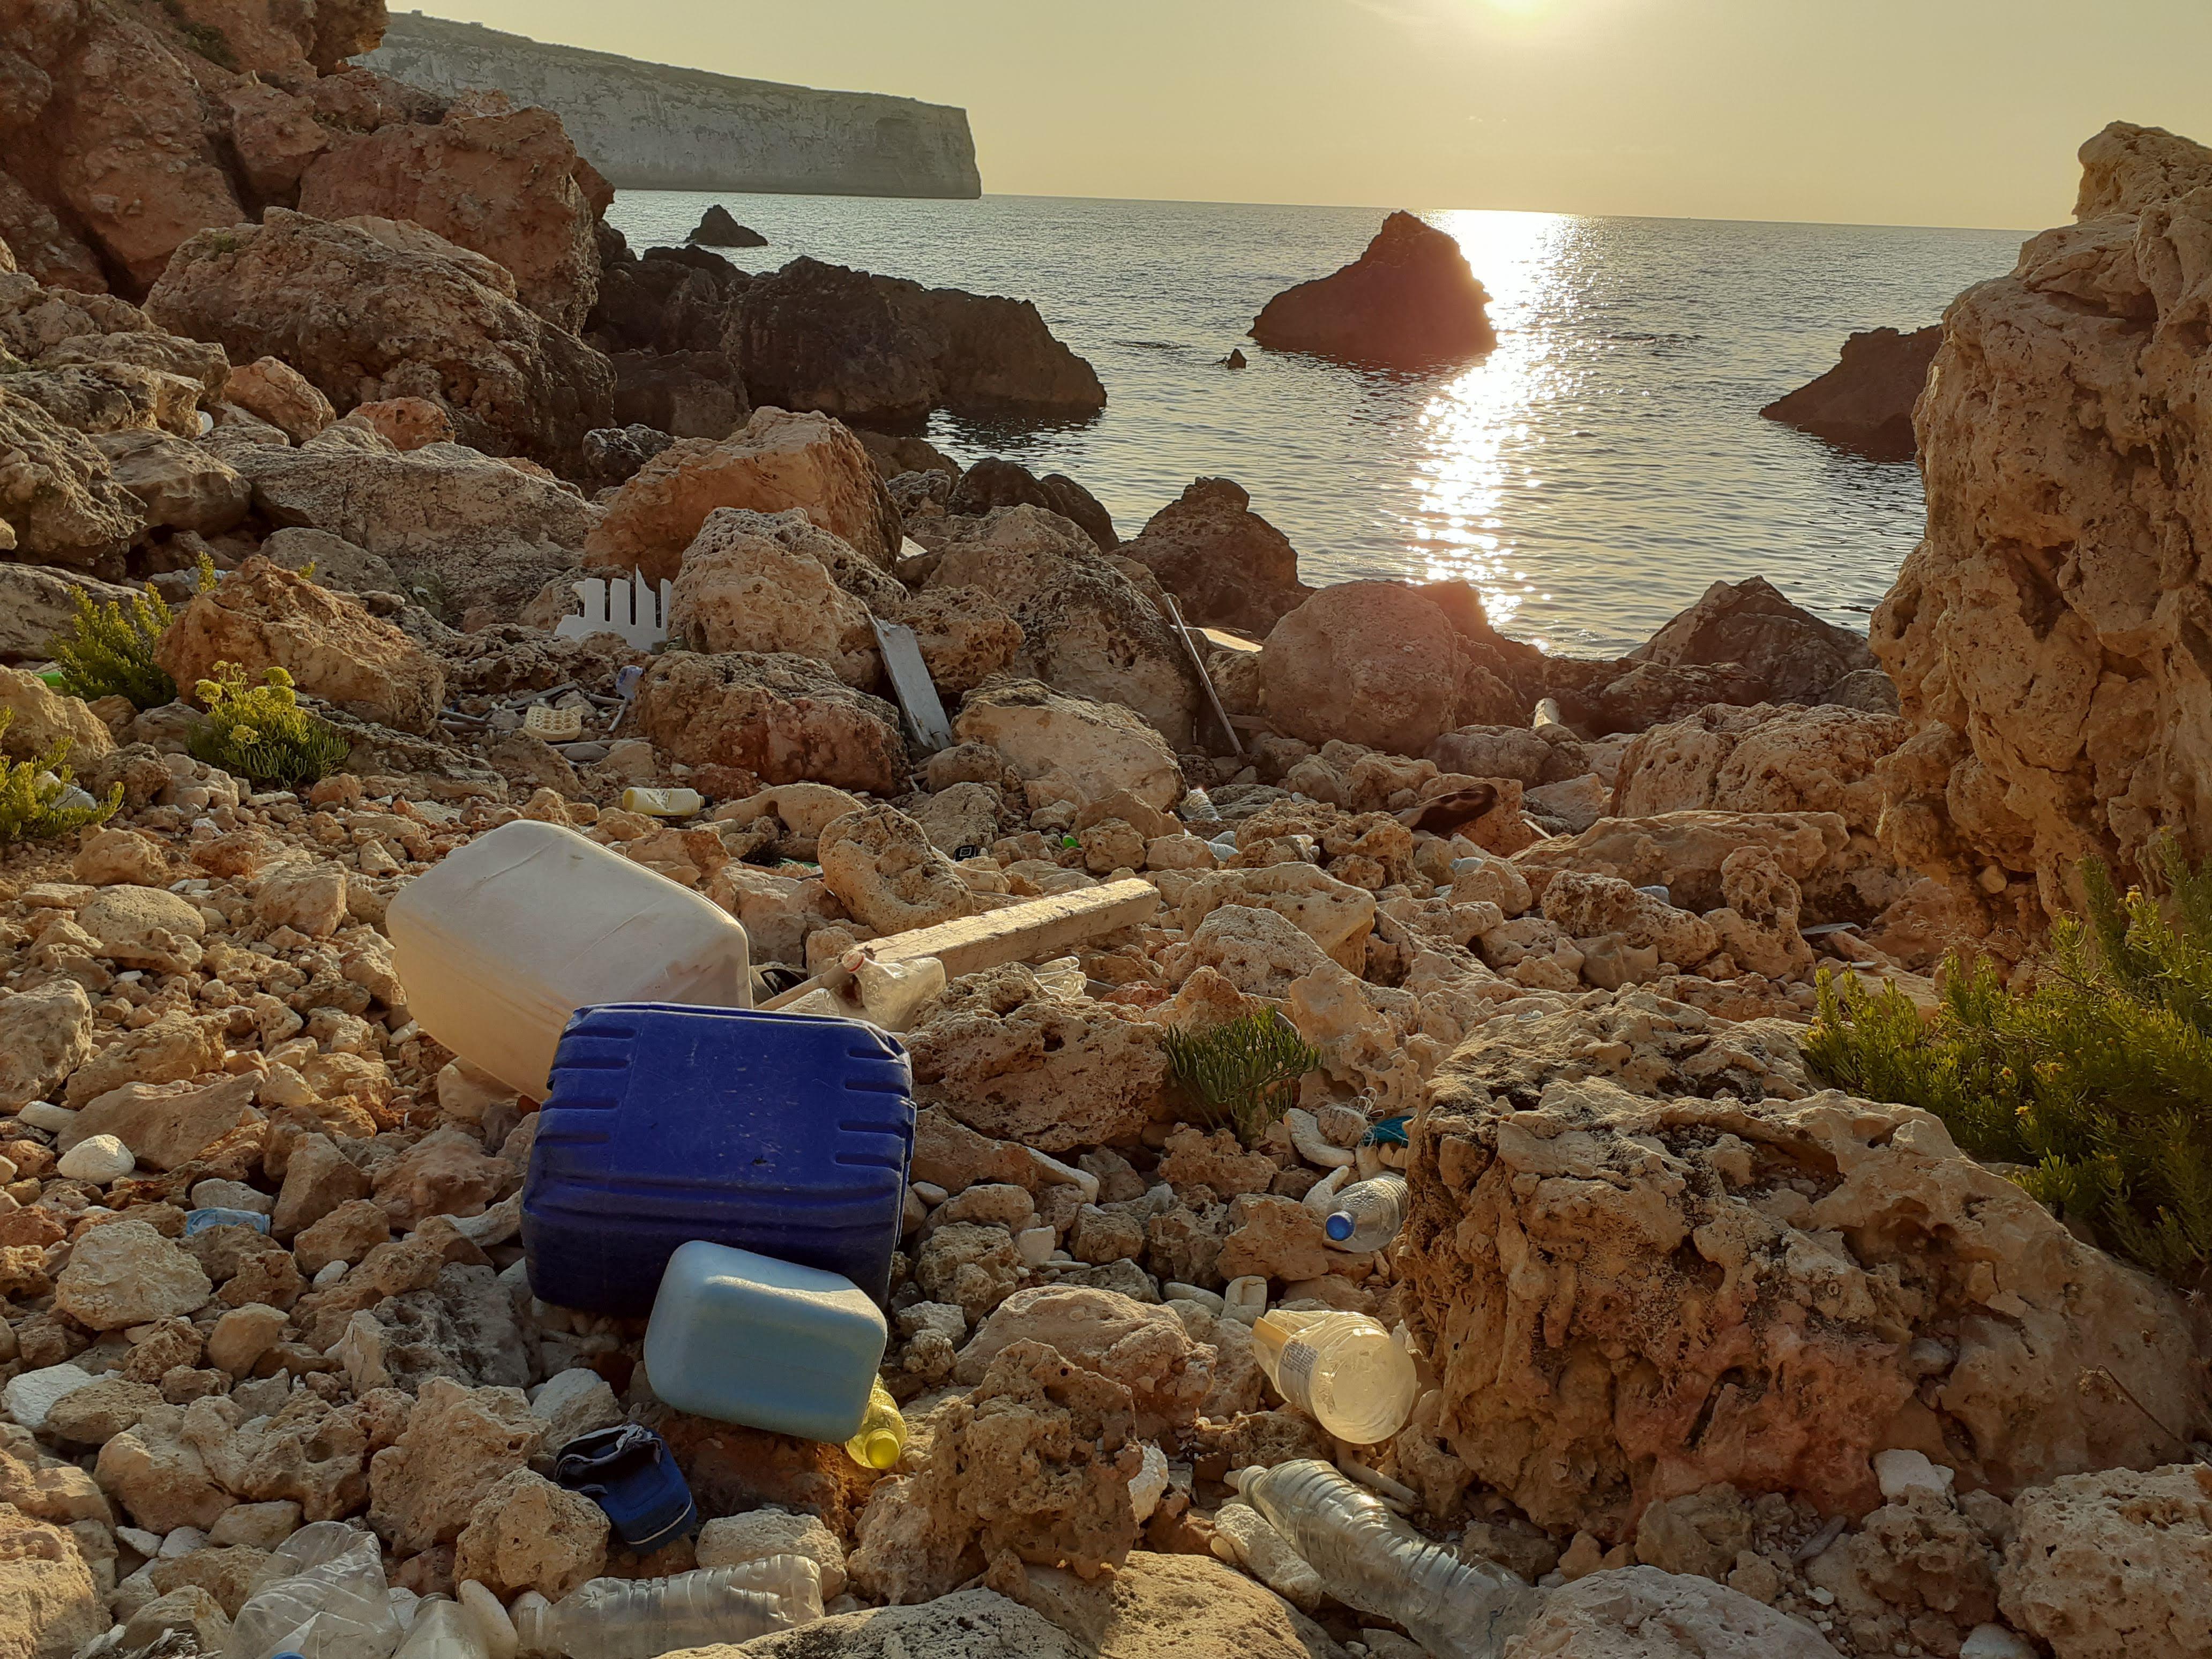 Trash in Fomm Ir-Rih Bay, Malta, 2019.